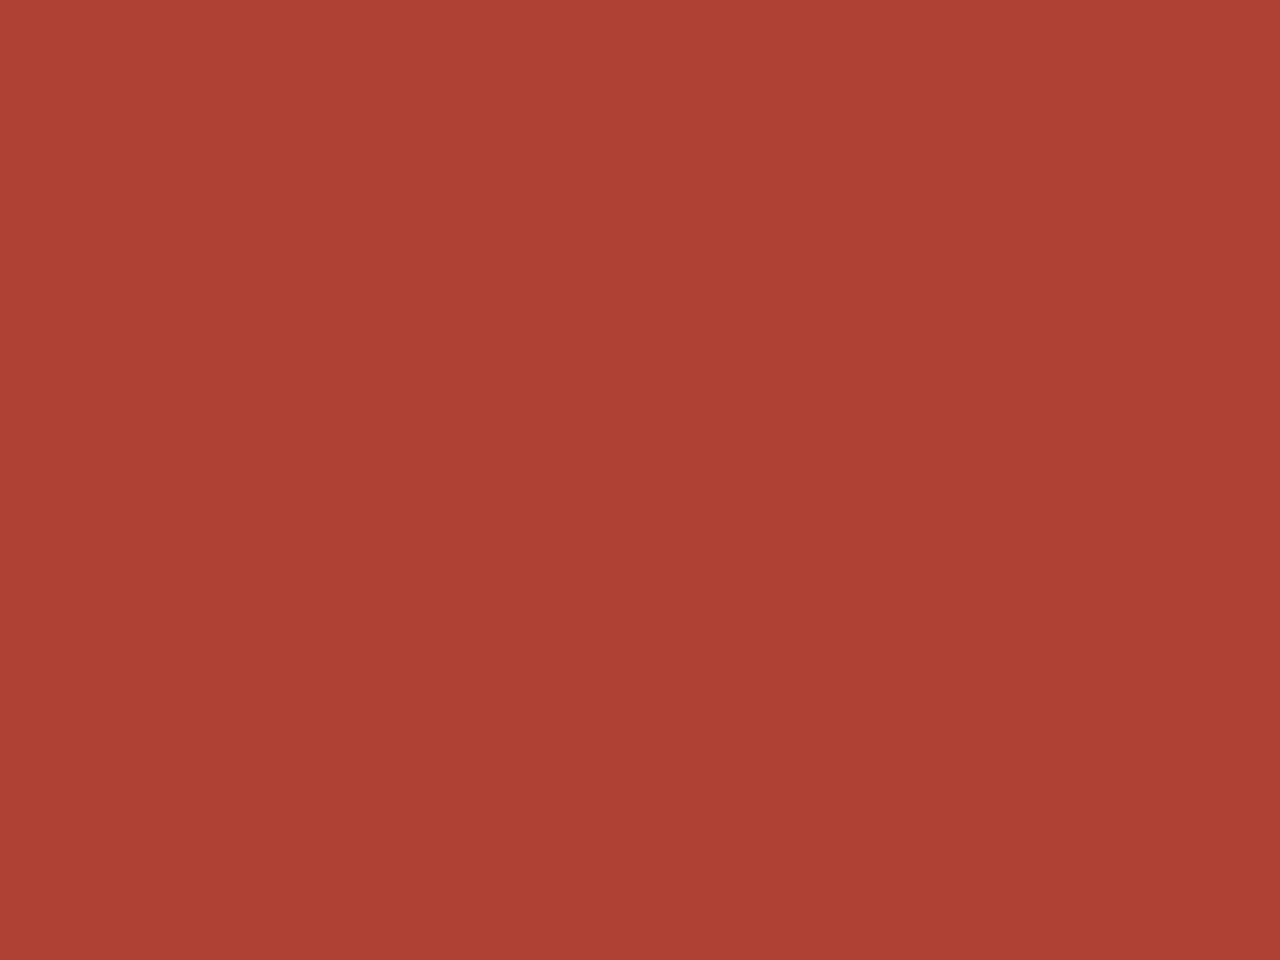 1280x960 Medium Carmine Solid Color Background